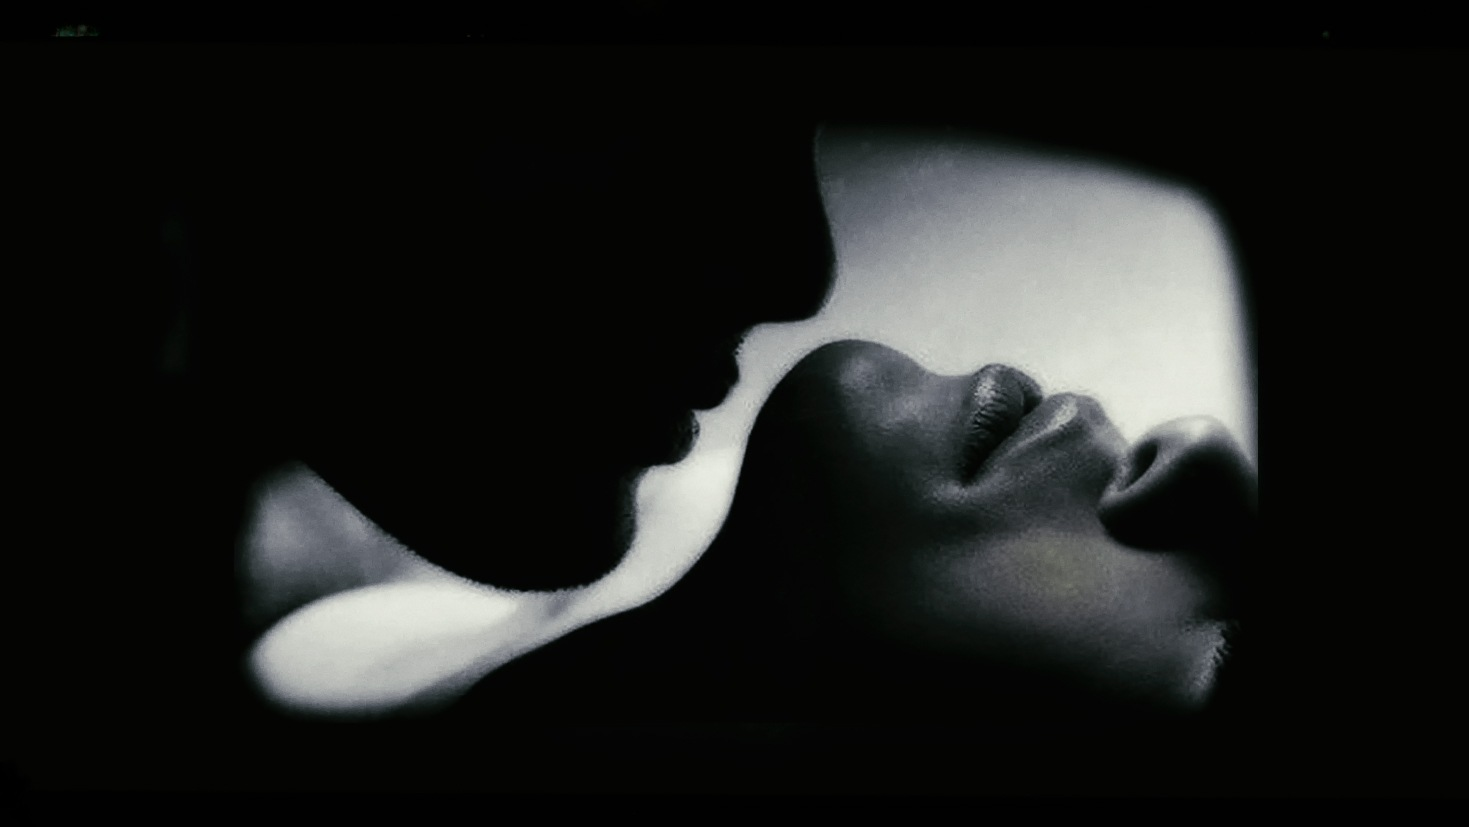 Near The Shadow by Vladimir Desancic